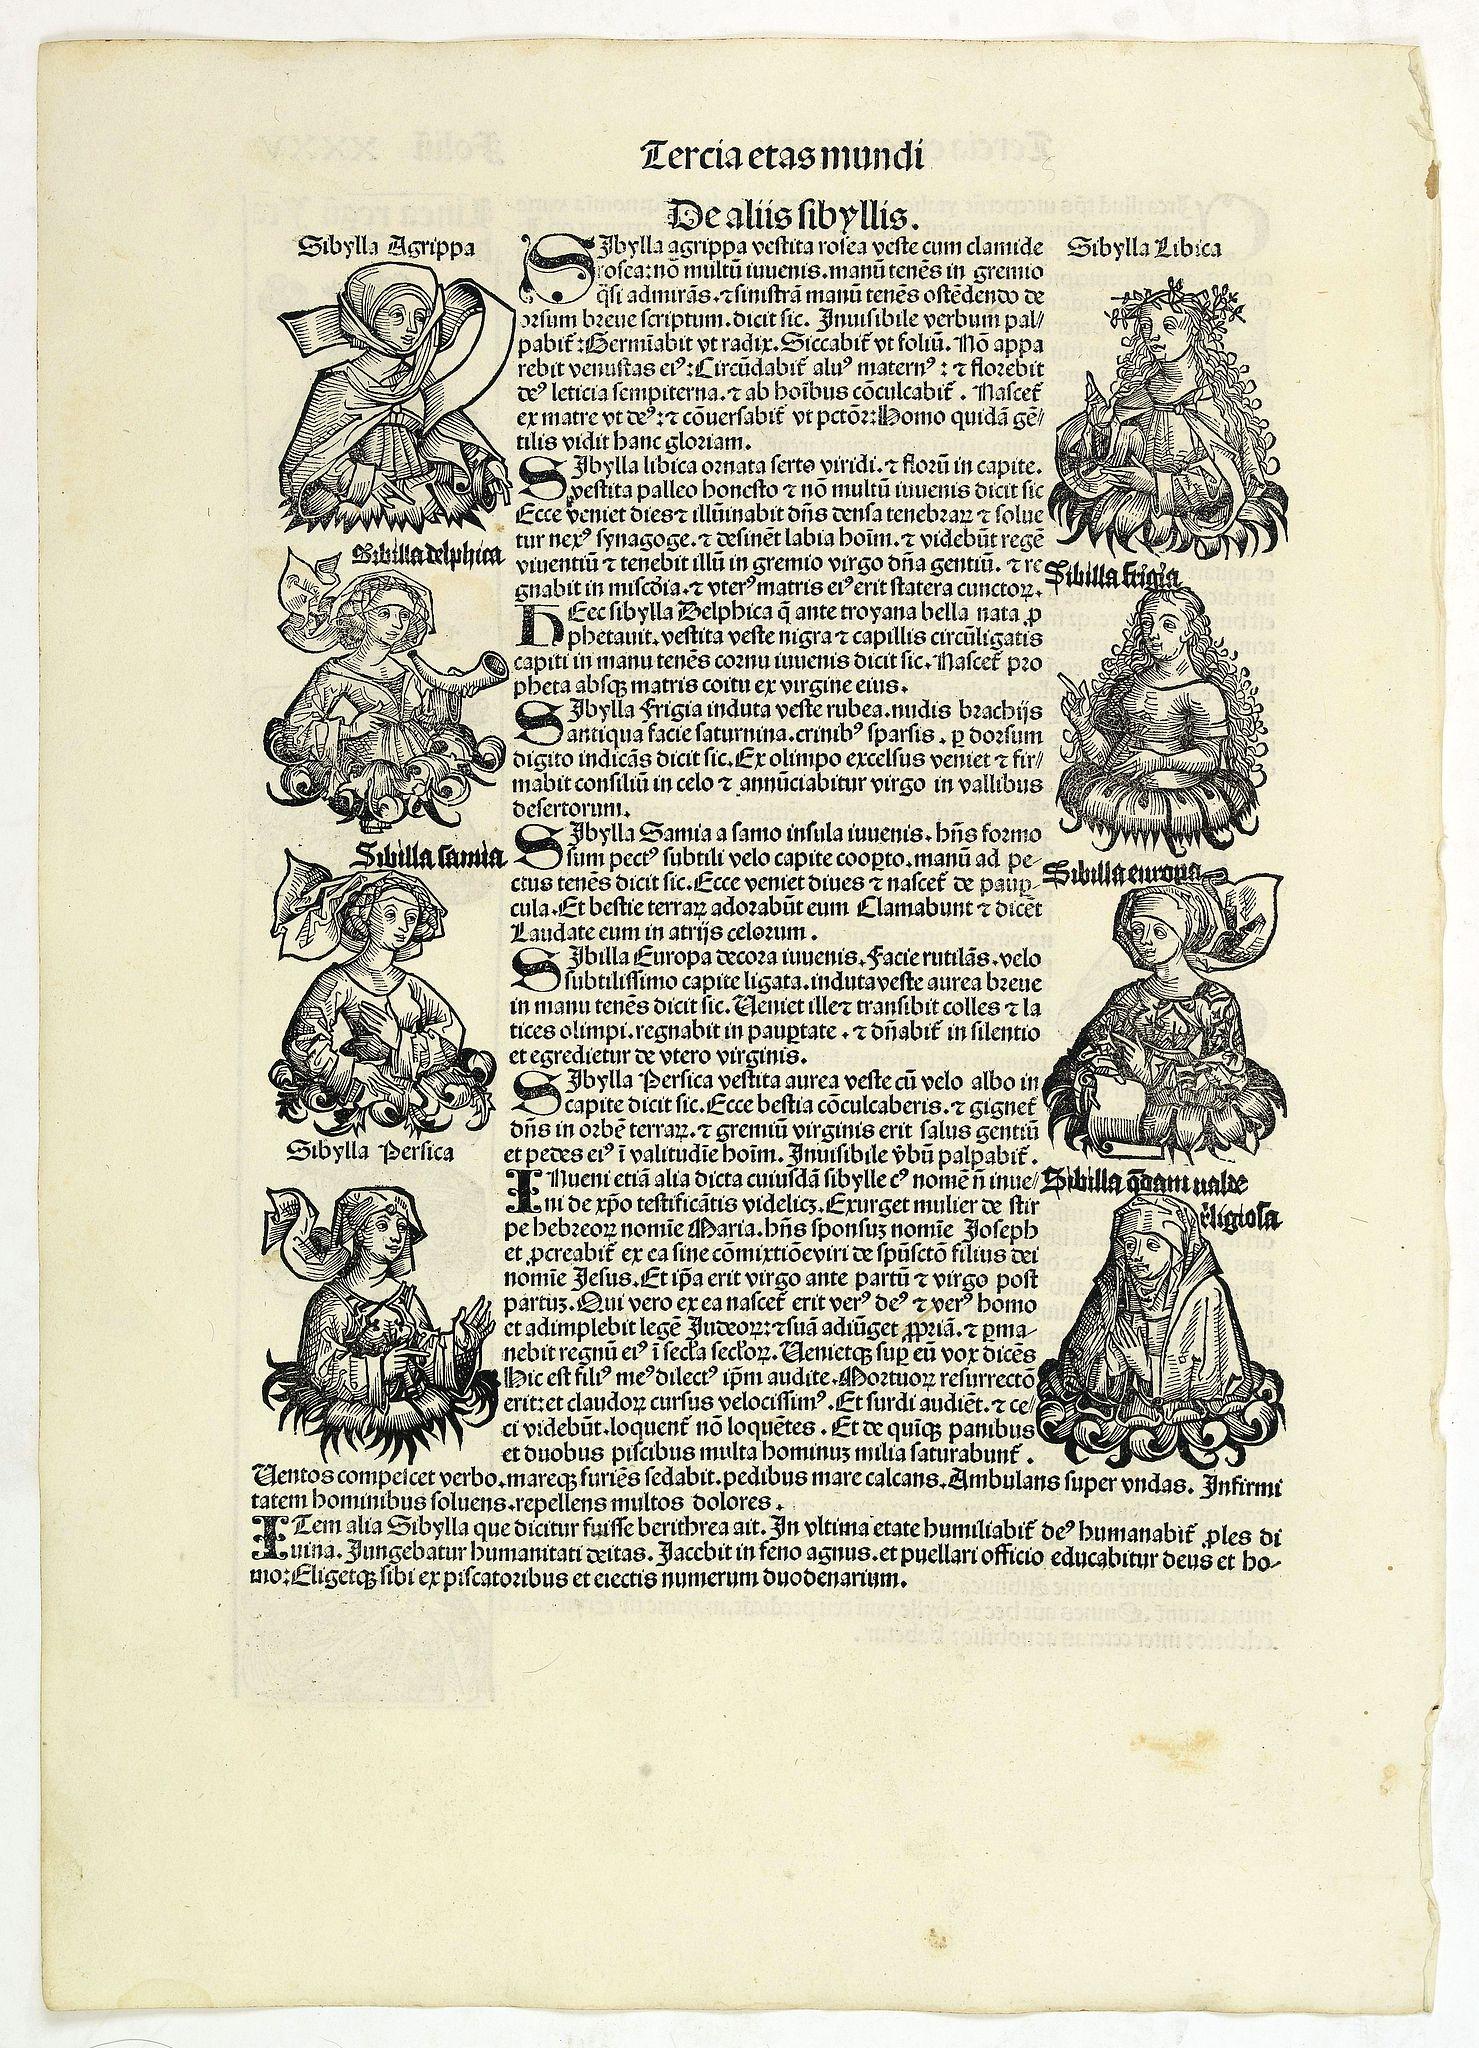 SCHEDEL, H. -  Tercia Etas Mundi. Folium.XXXV